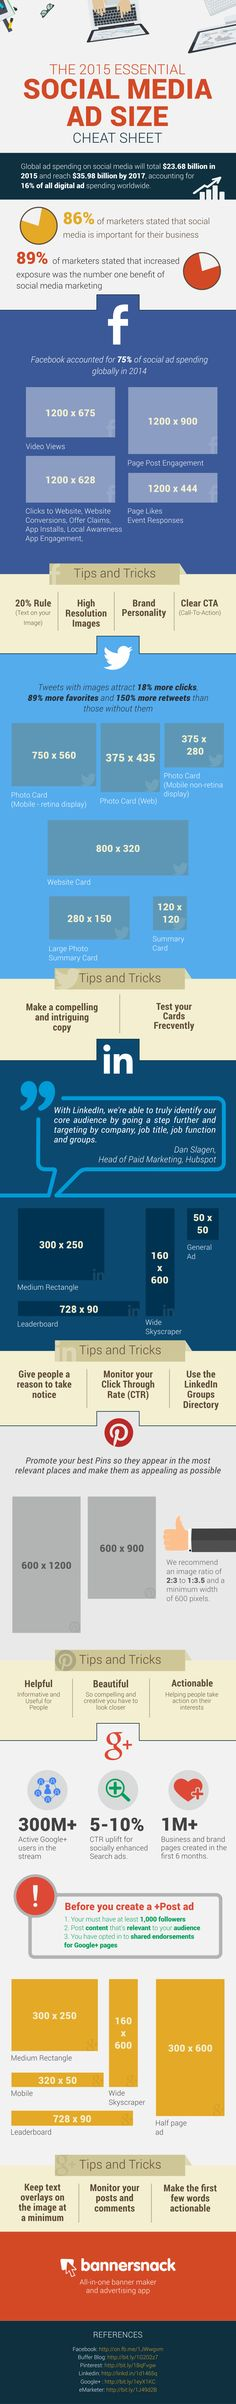 INFOGRAPHIC: The 2015 Essential Social Media Ad Size Cheat Sheet - @socialmediadel